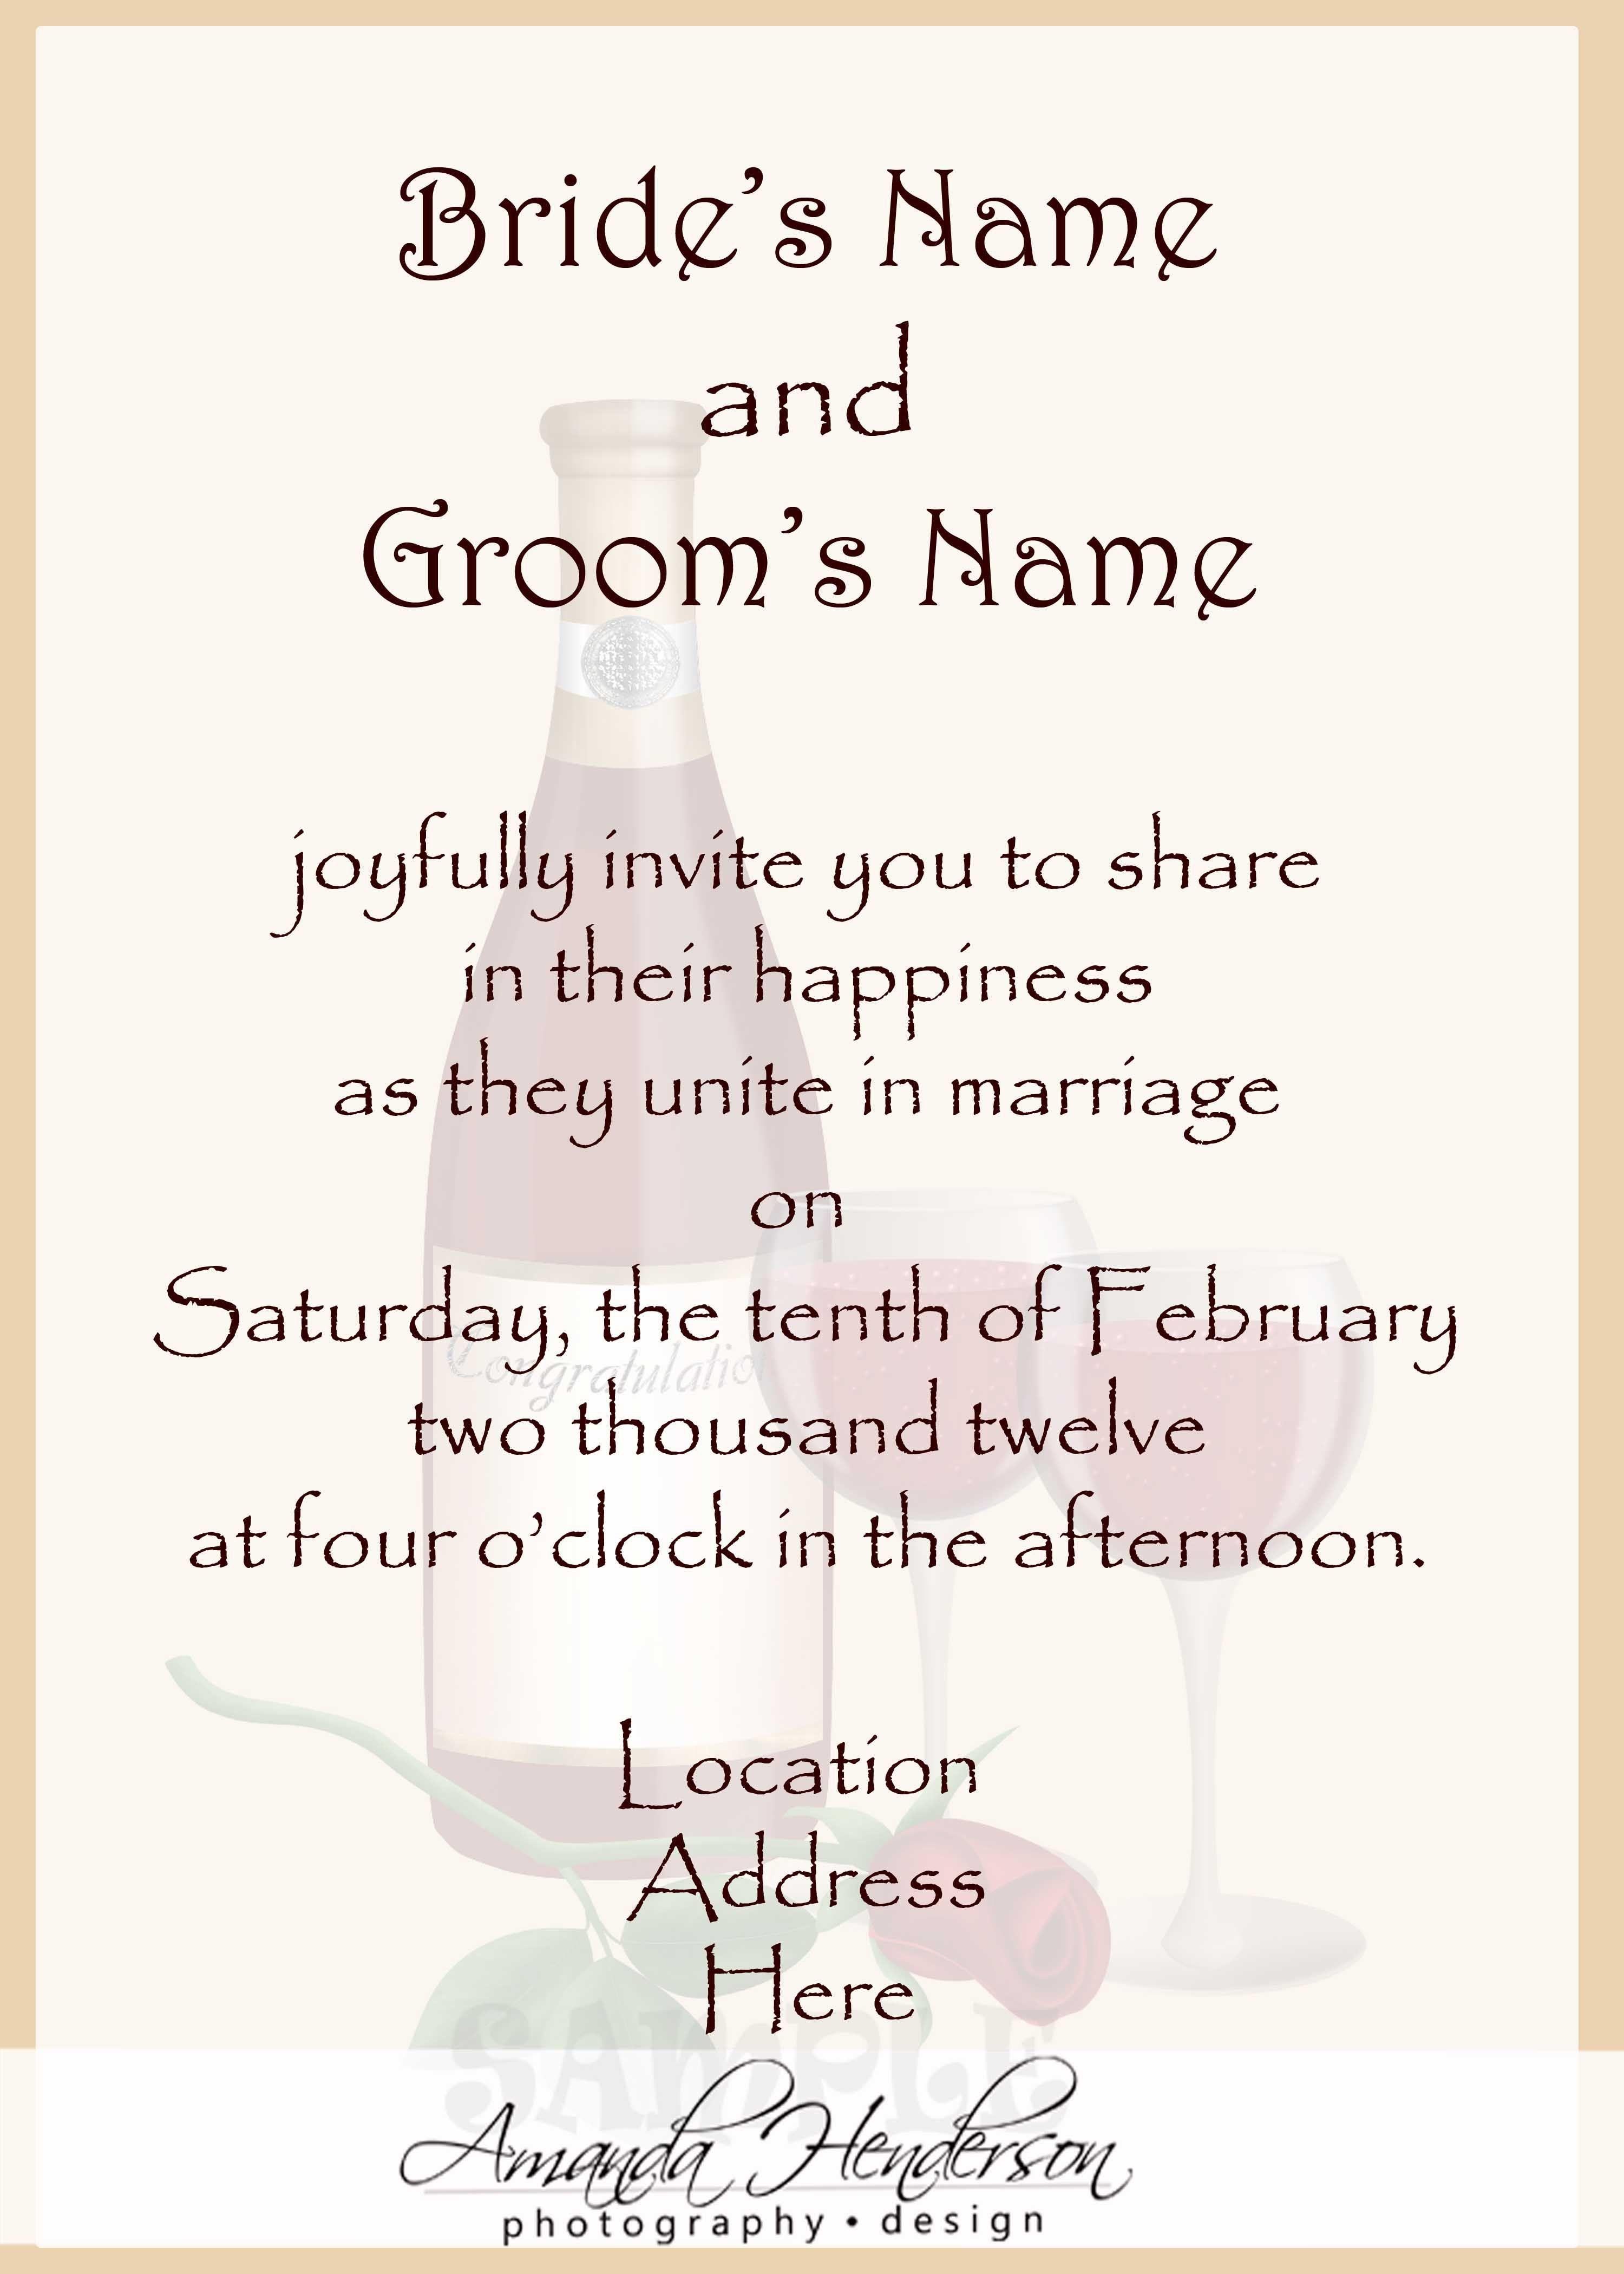 sample-wedding-invitation-card | wedding invitations | Pinterest ...